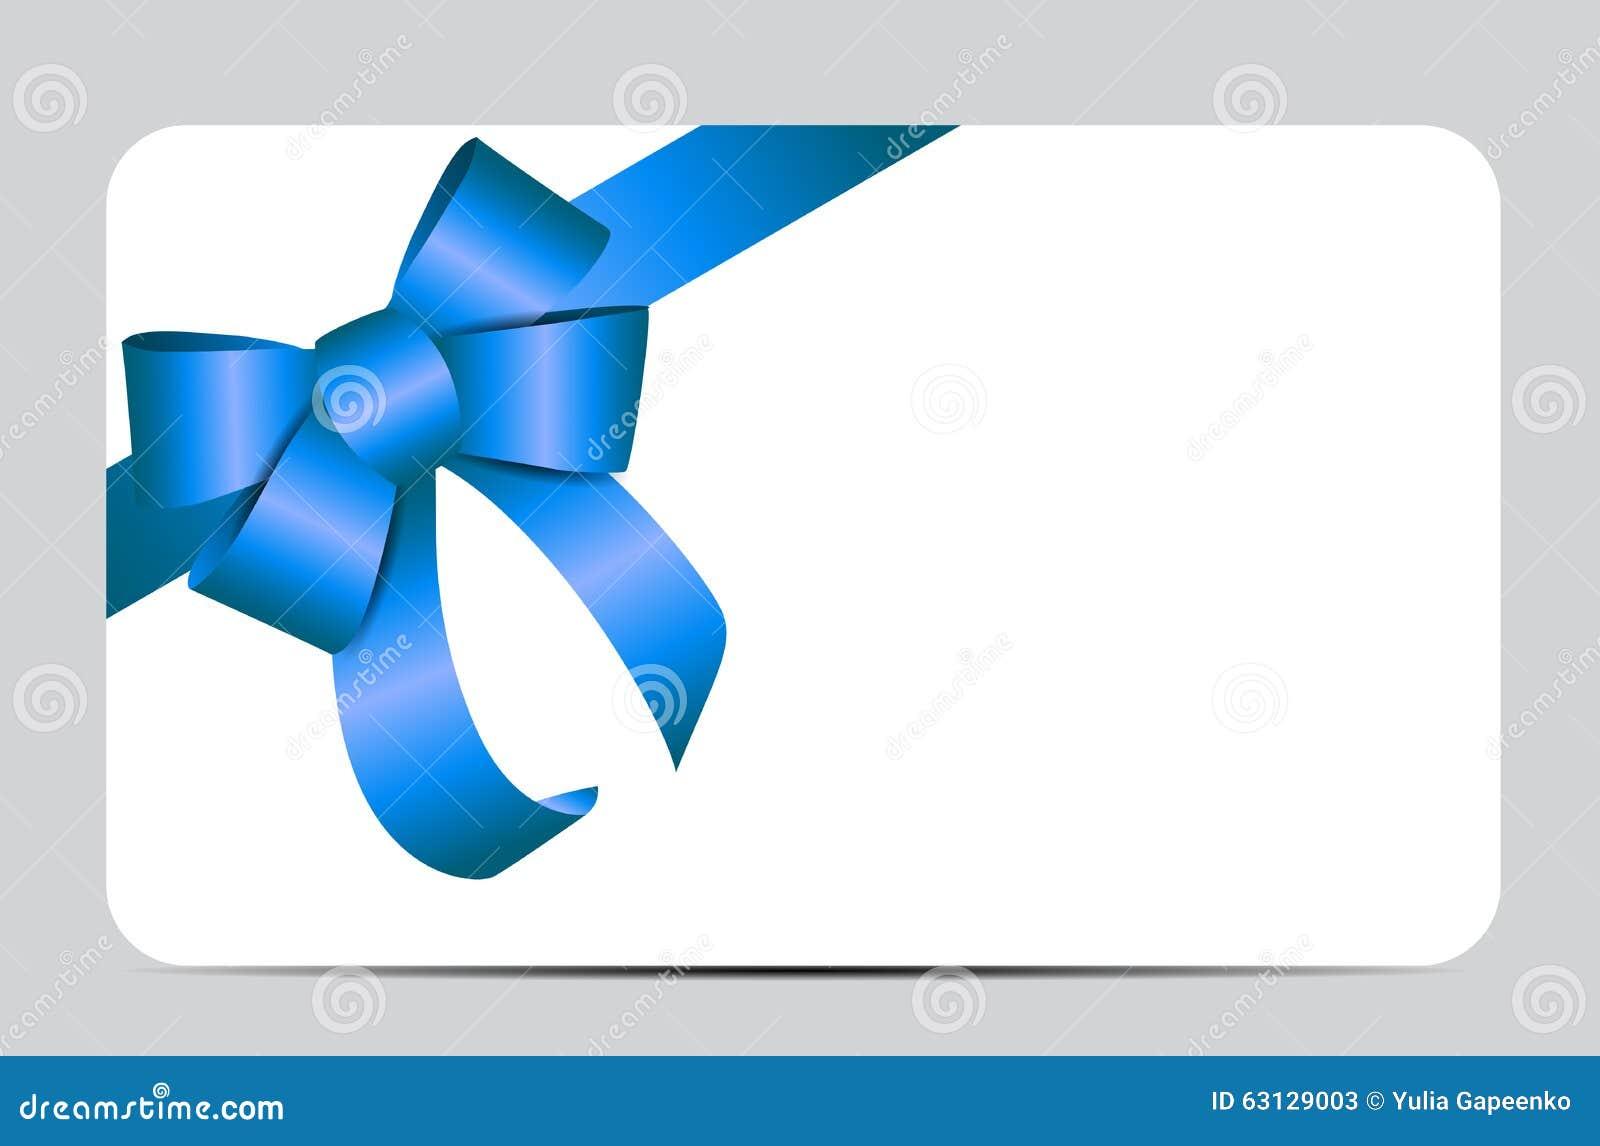 blue gift ribbon vector illustration stock vector illustration of paper awareness 63129003. Black Bedroom Furniture Sets. Home Design Ideas